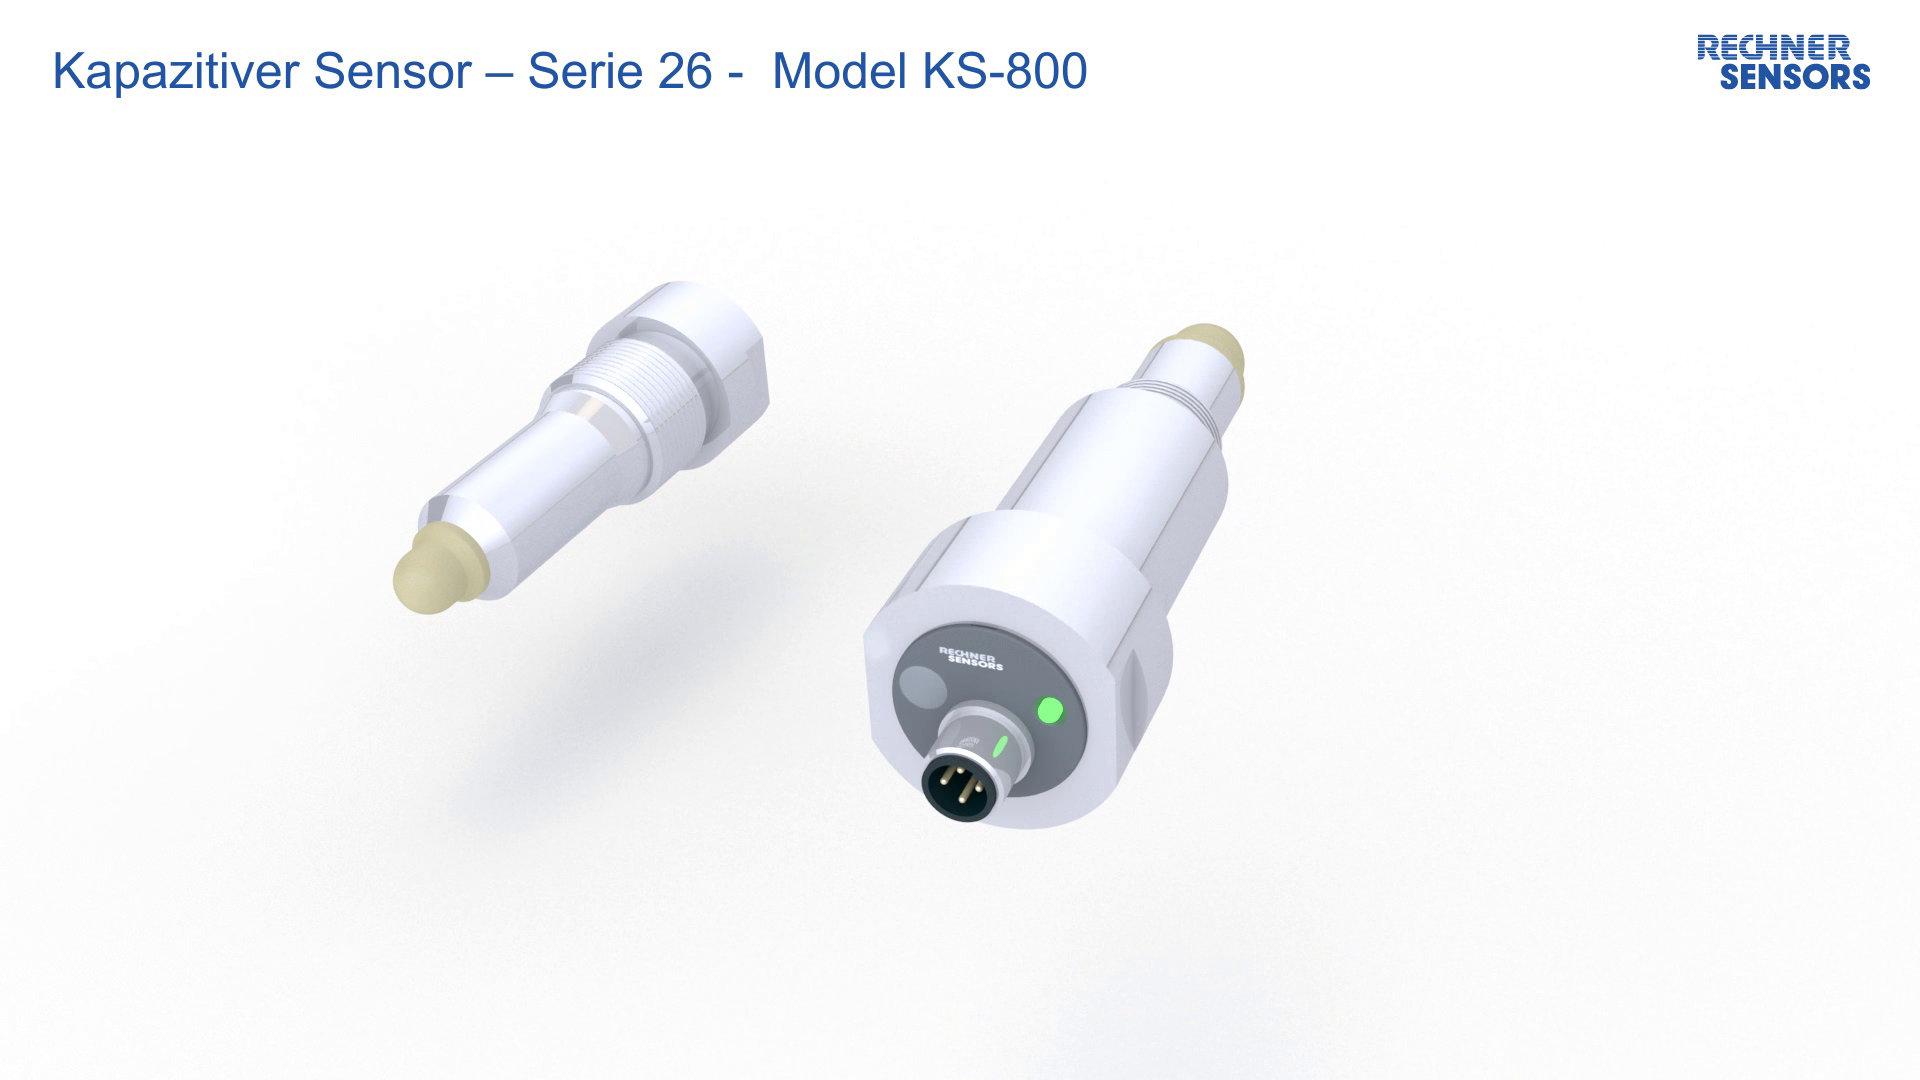 kapazitive sensoren industrieproduktion